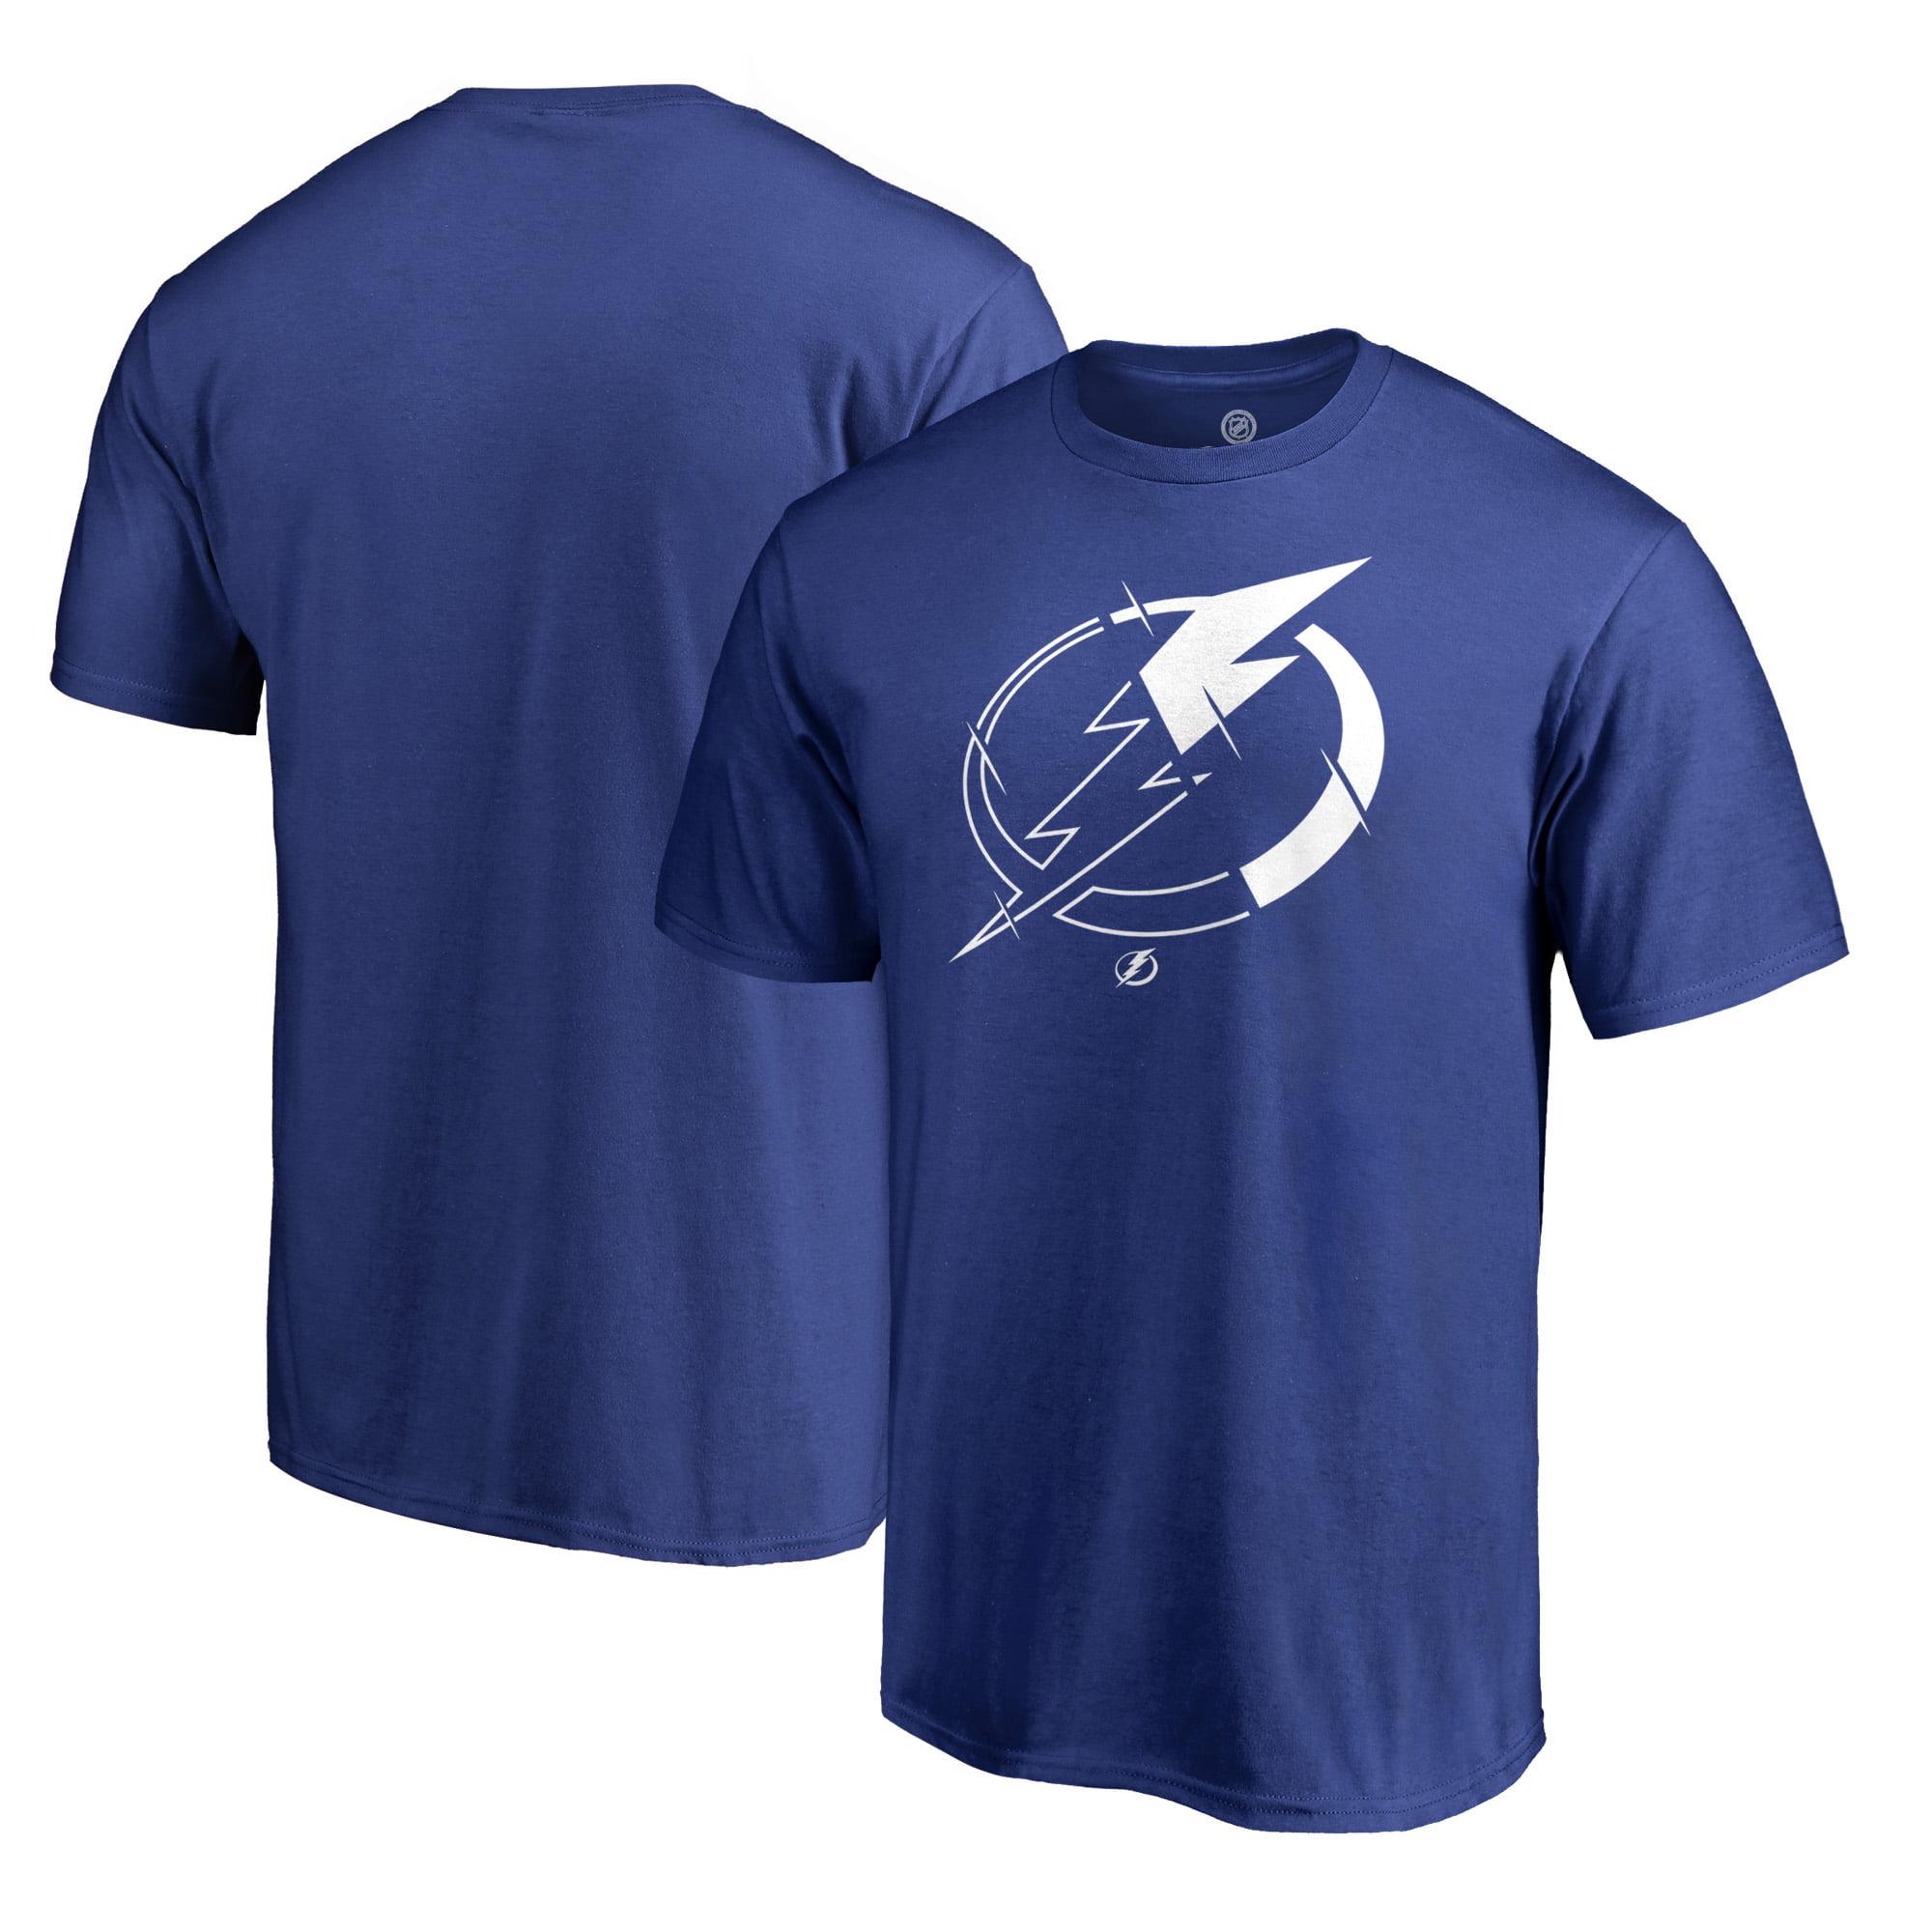 Tampa Bay Lightning Fanatics Branded X-Ray T-Shirt - Royal